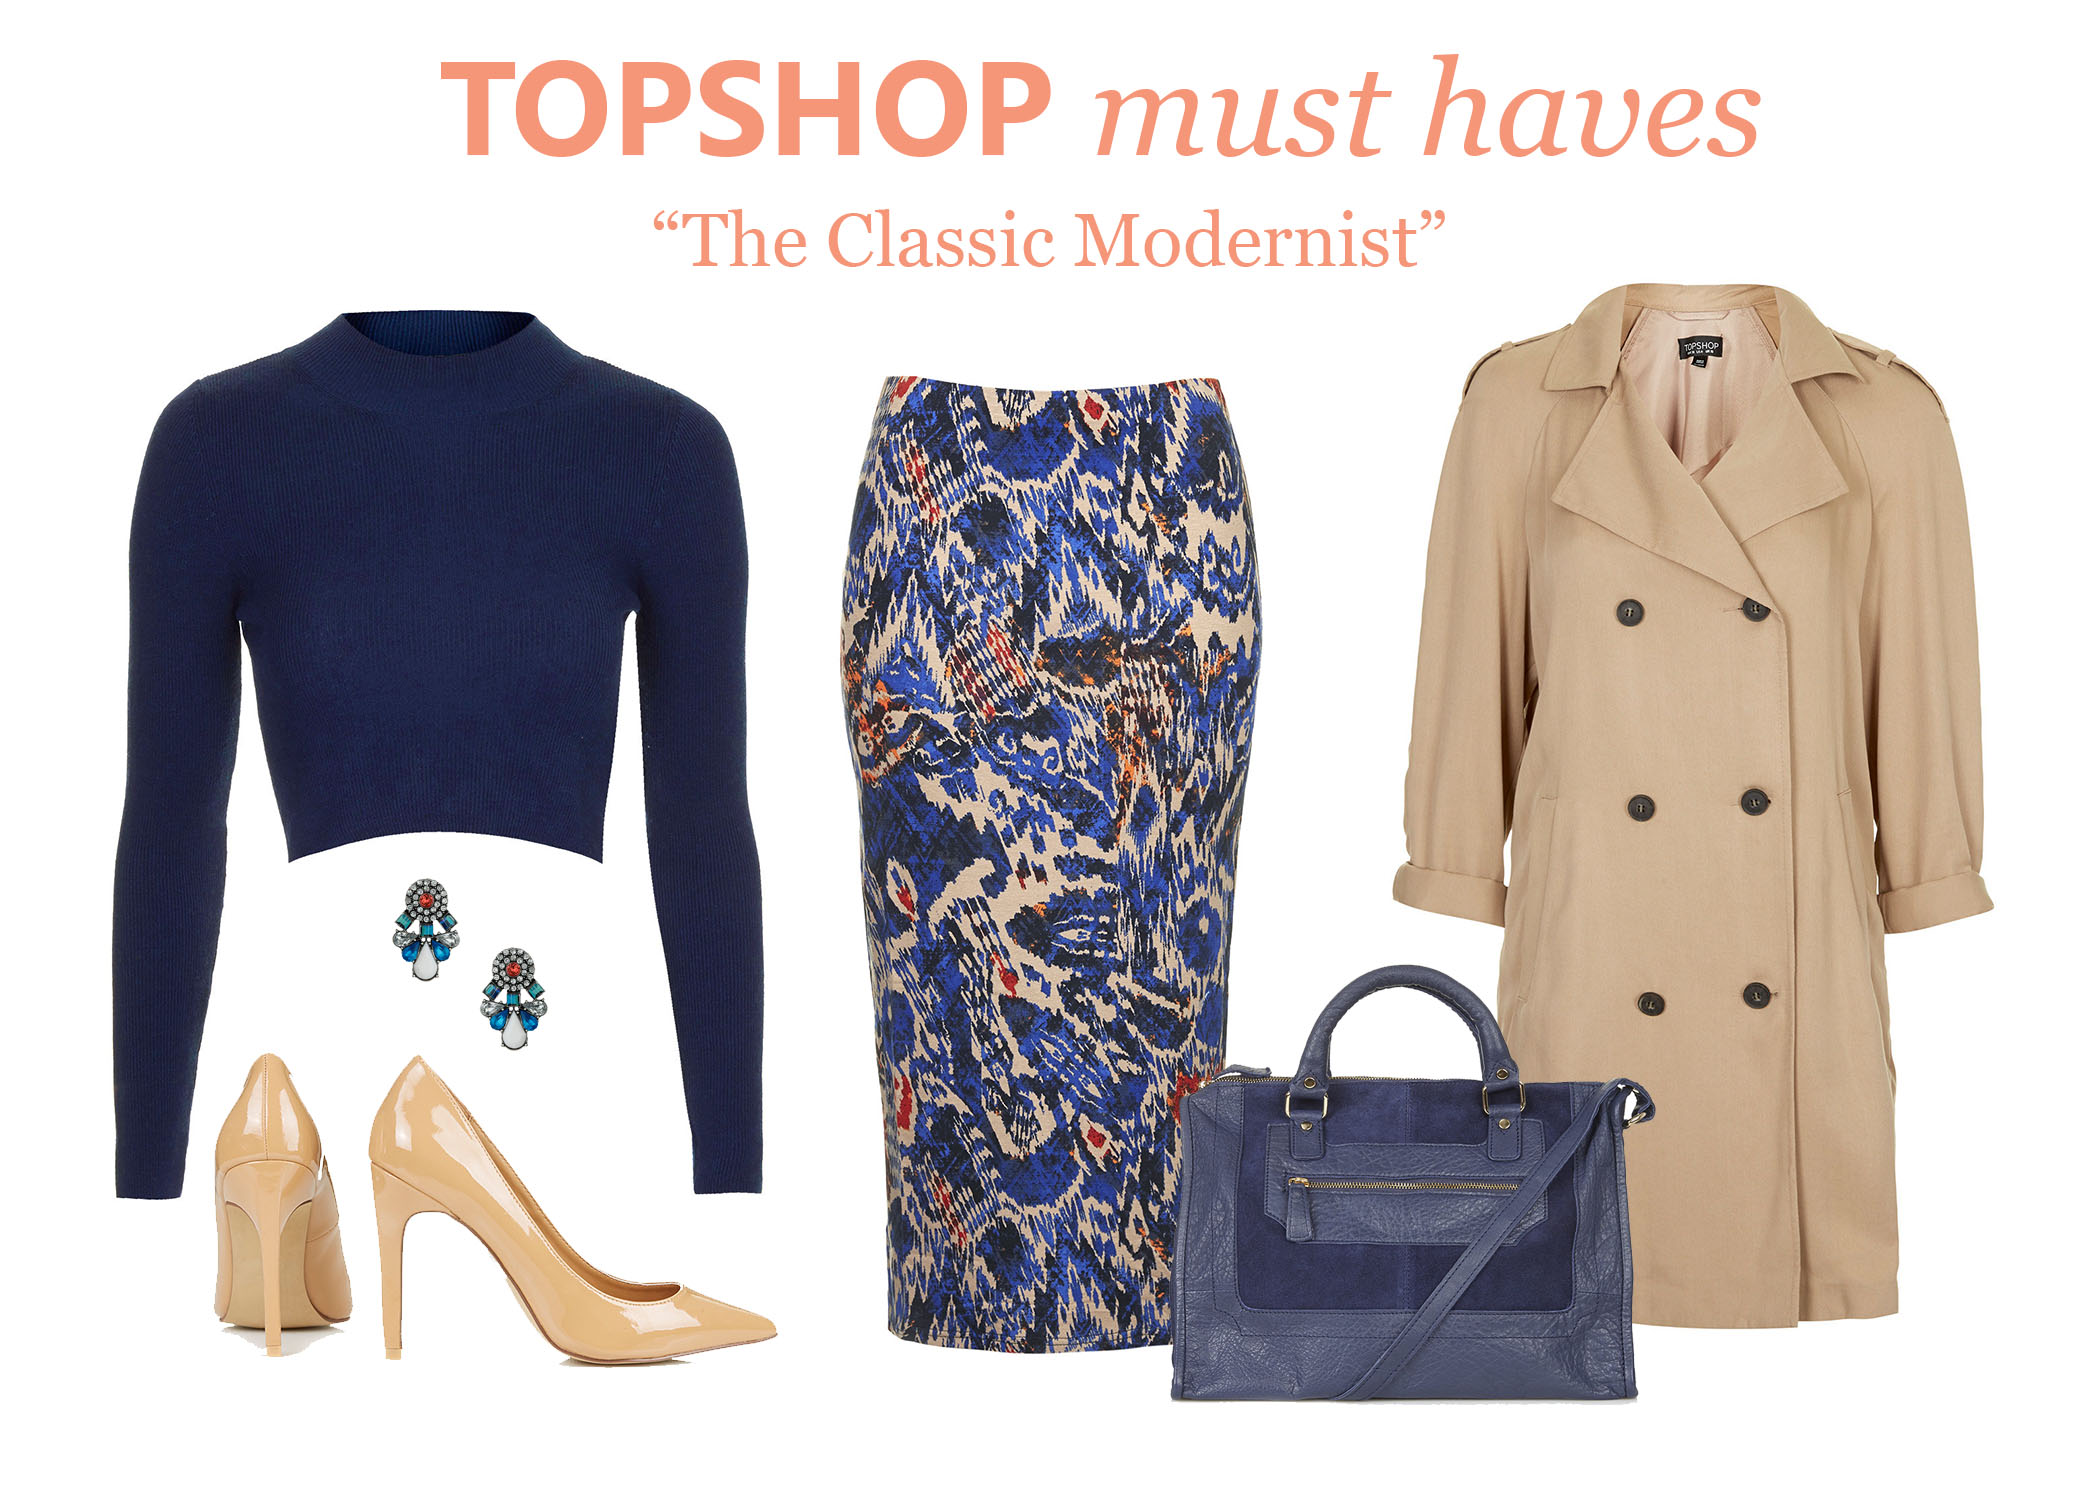 TOPSHOP- Classic Modernist